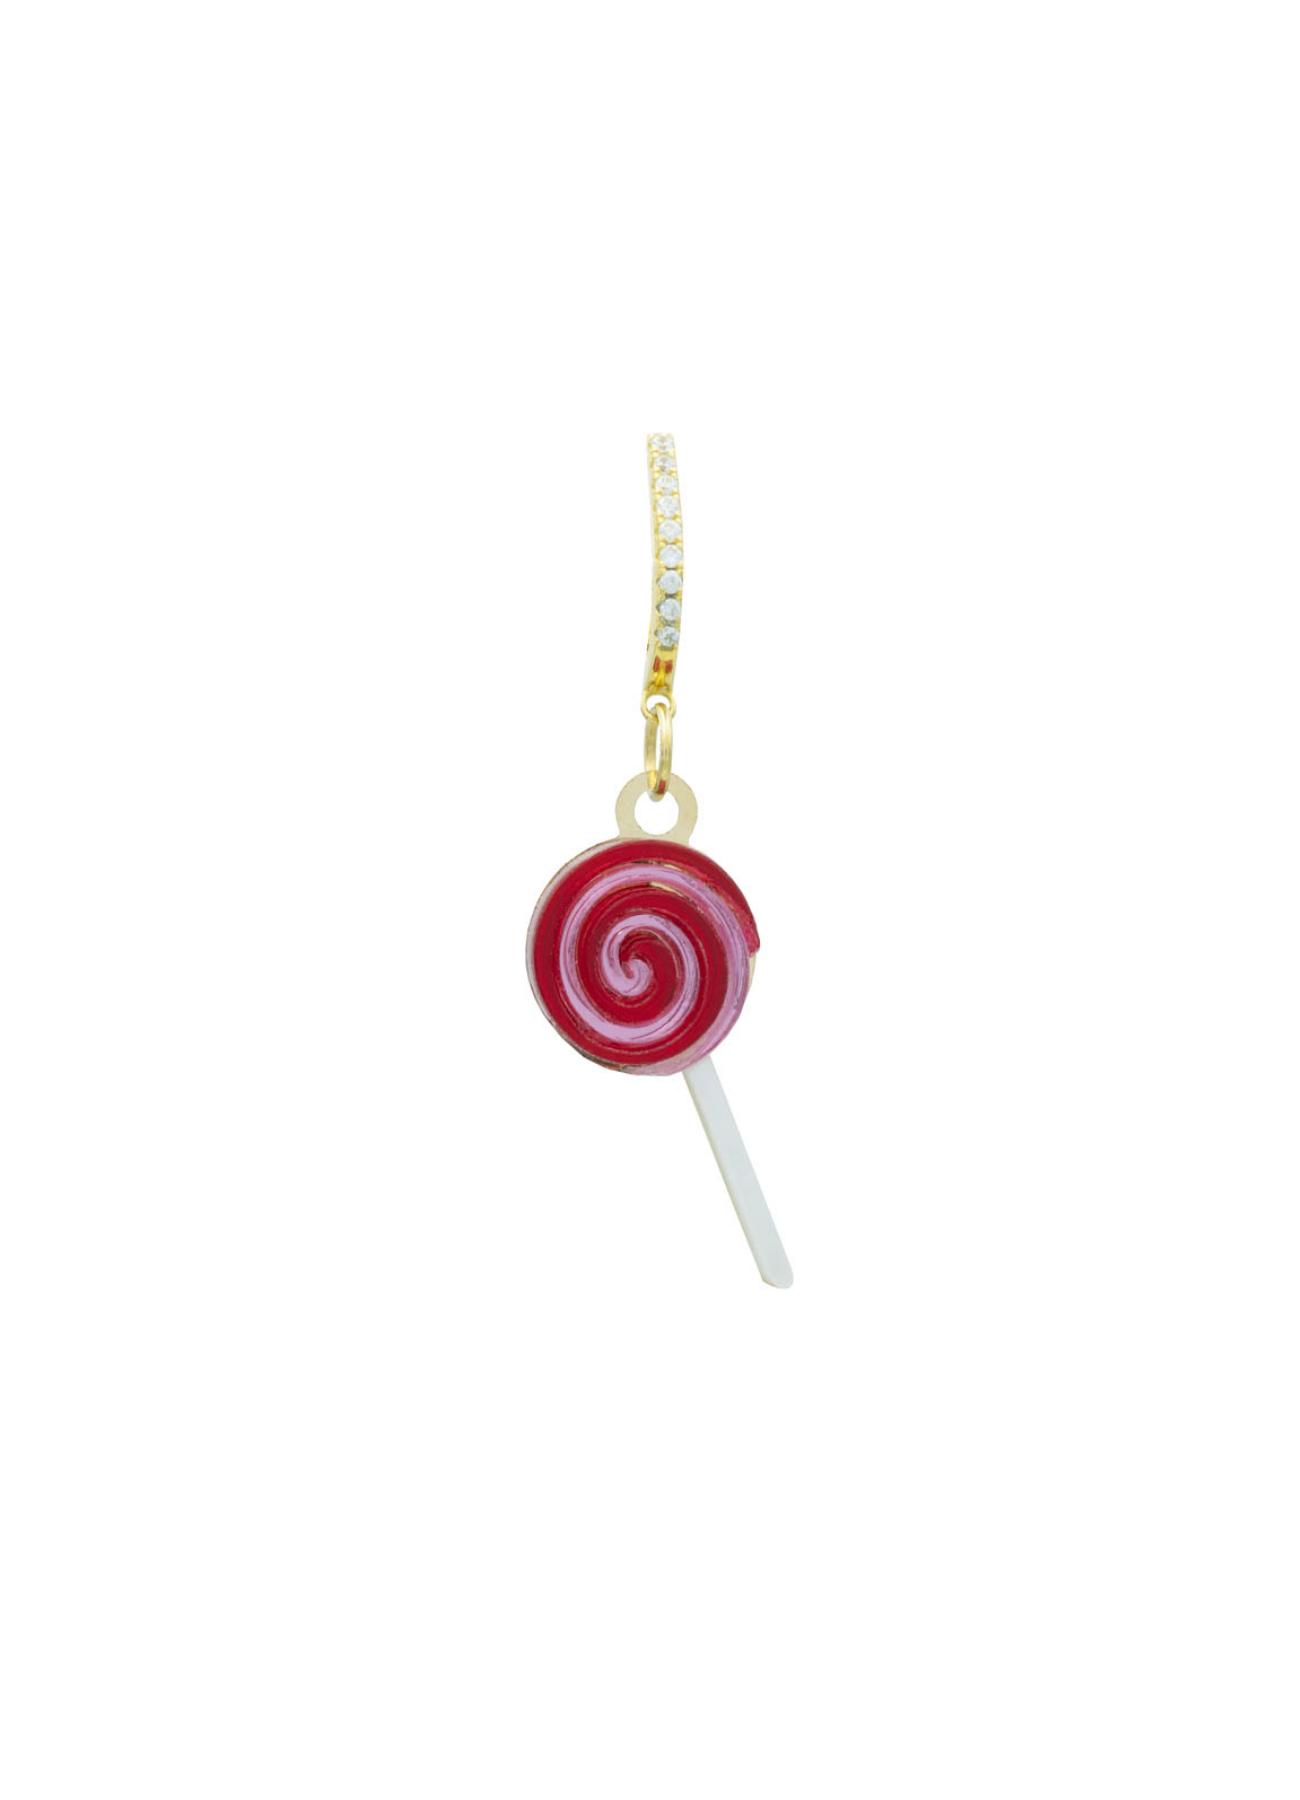 KIWI+POMELO   Berry Lollypop